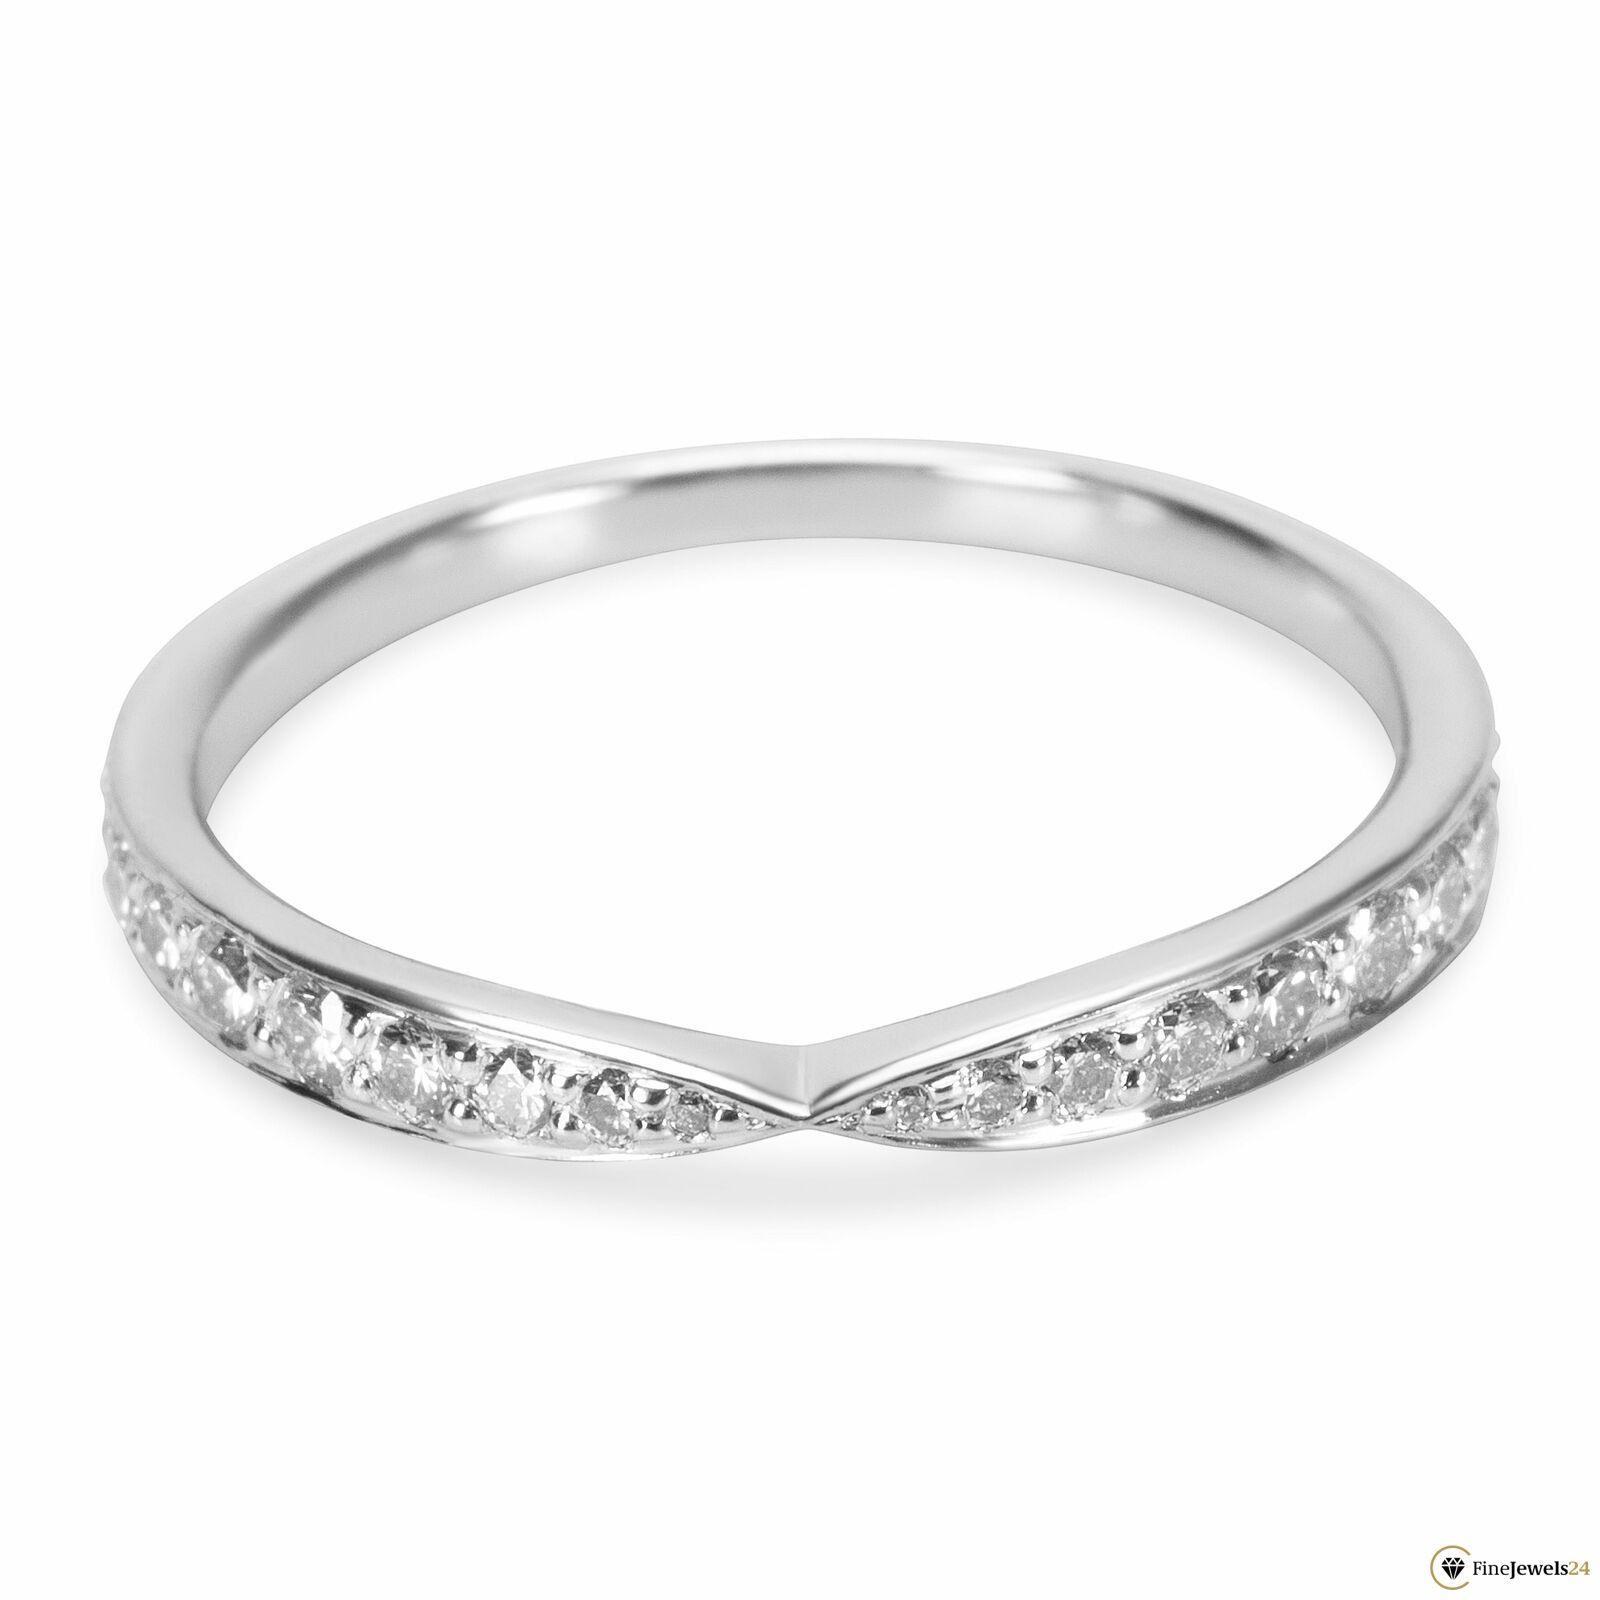 Pingabriela On Wedding | Moissanite Engagement Ring